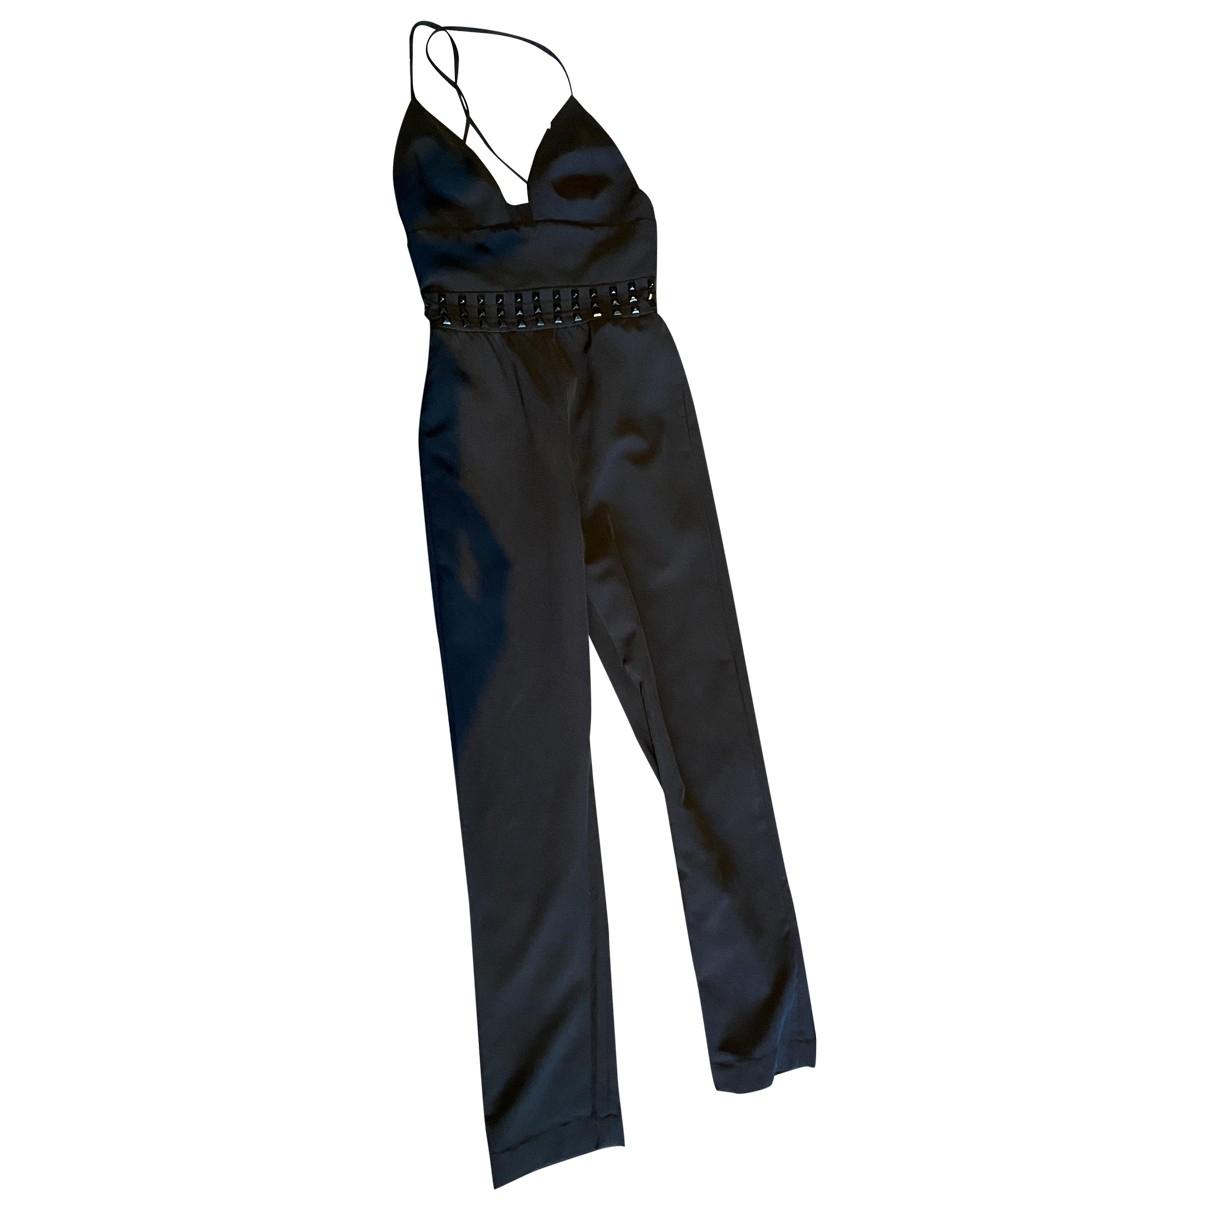 House Of Cb \N Black jumpsuit for Women XS International